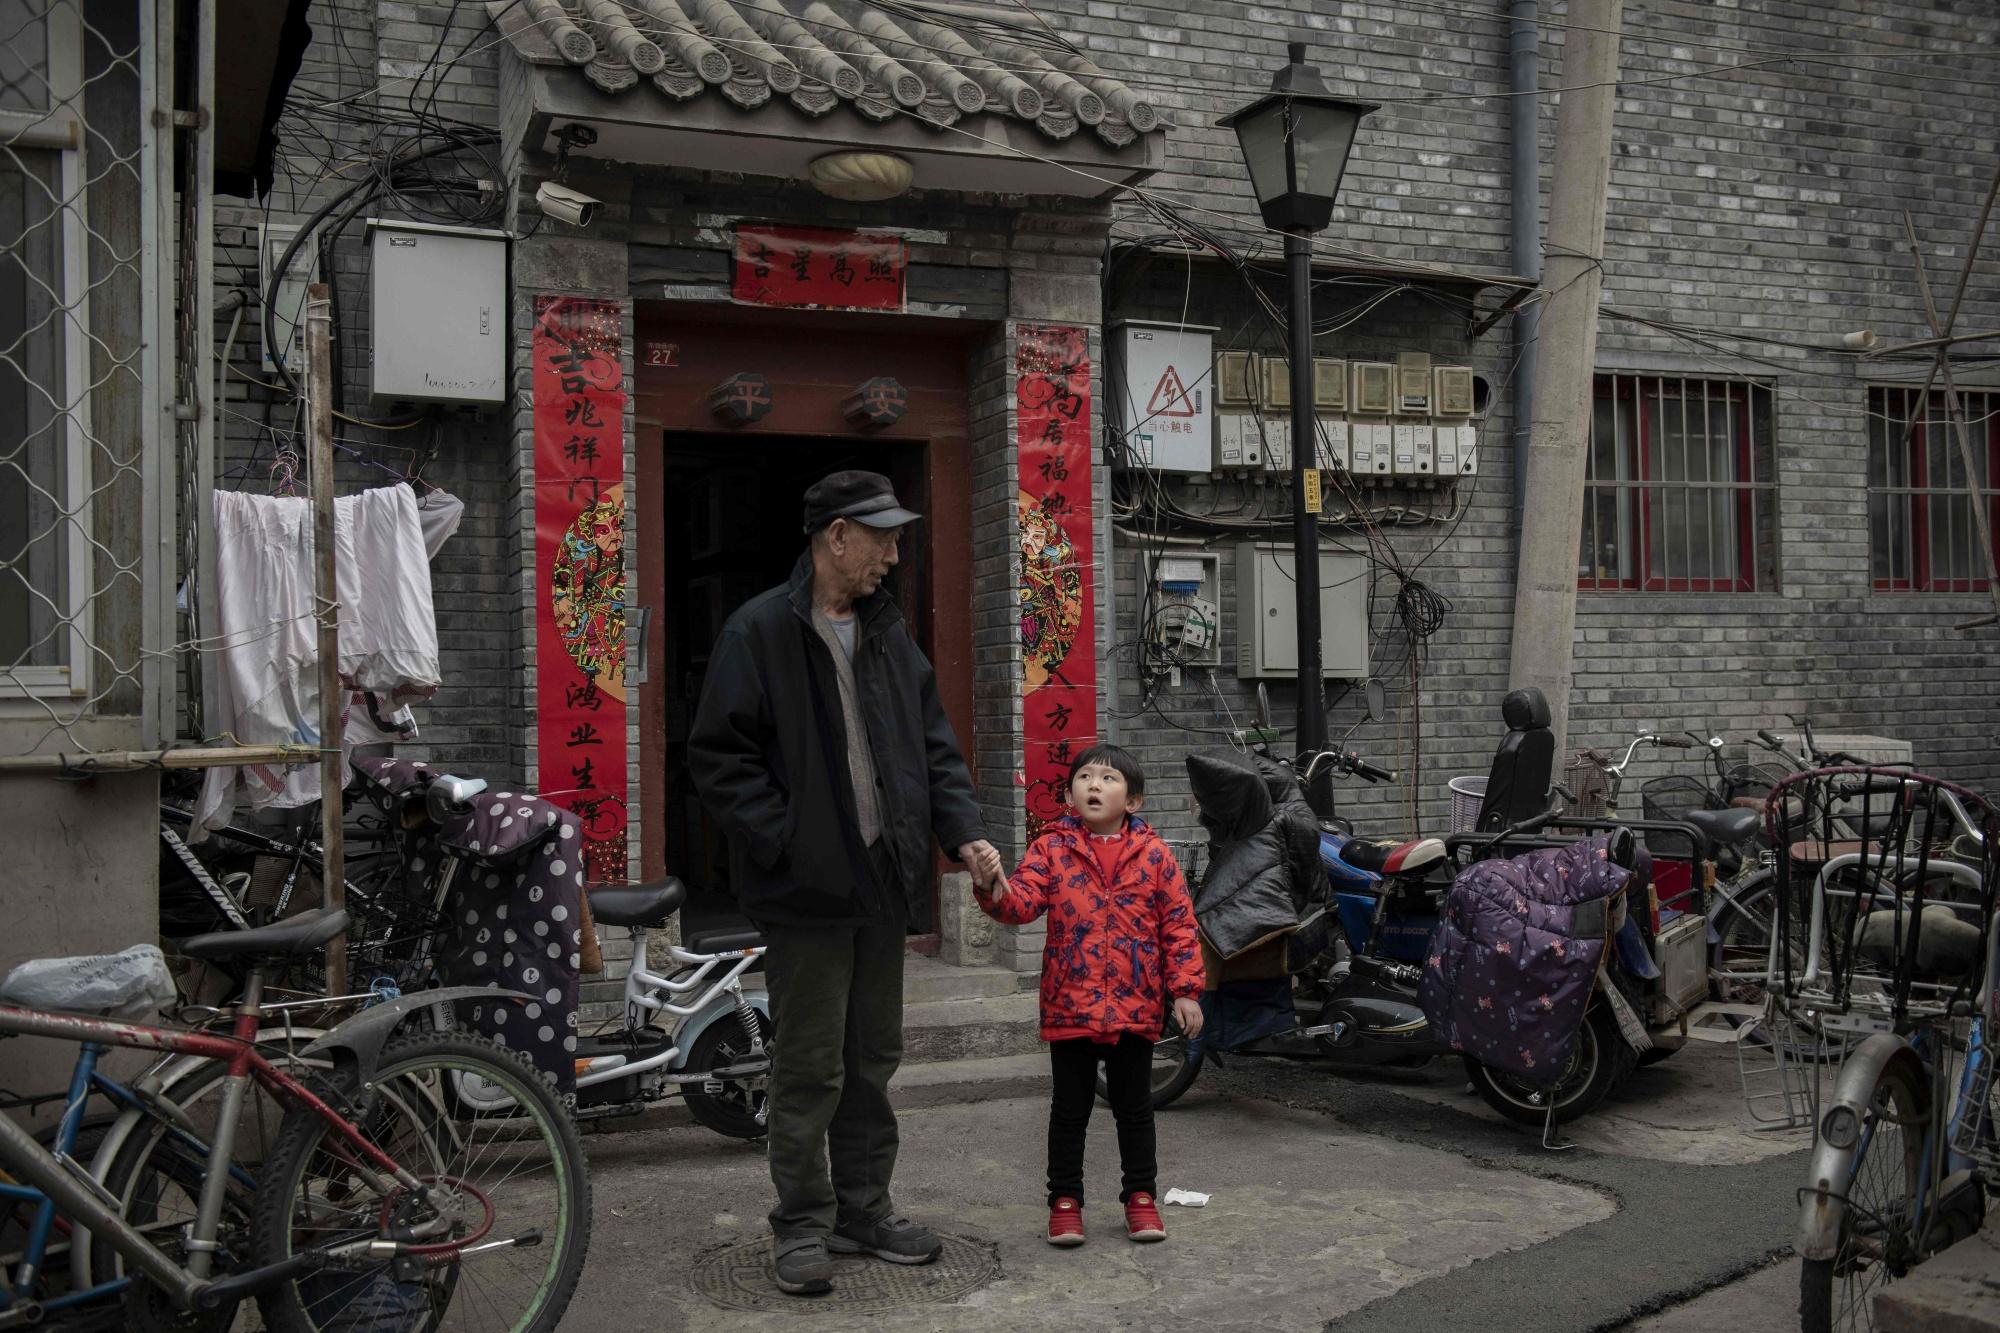 TOPSHOT-CHINA-LIFESTYLE